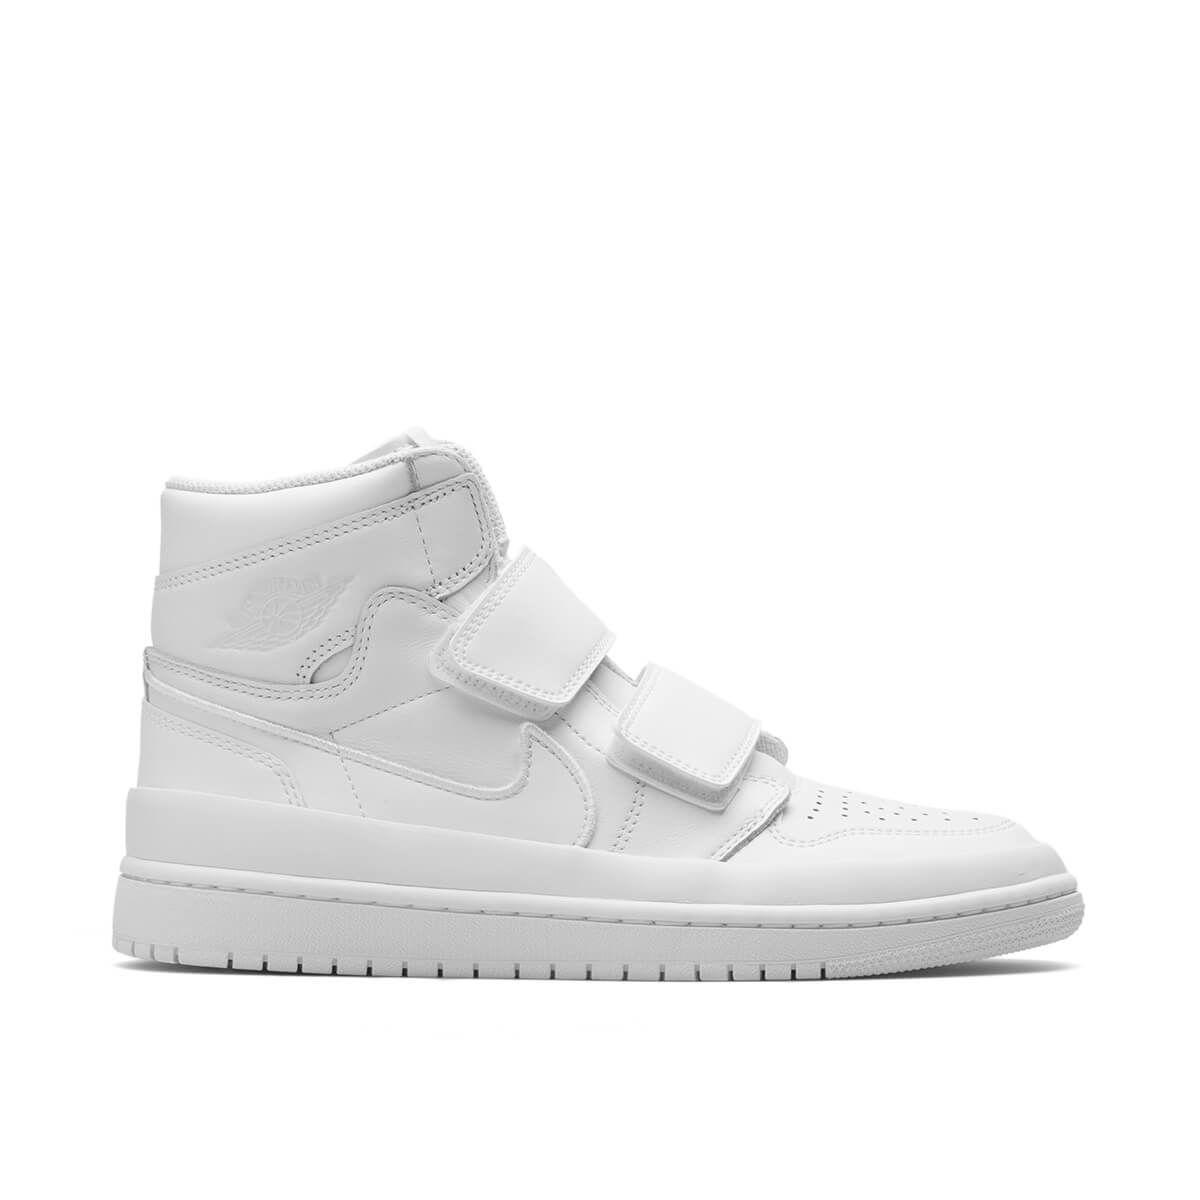 Nike Air Jordan 1 Re Hi Double Strp In White | ModeSens